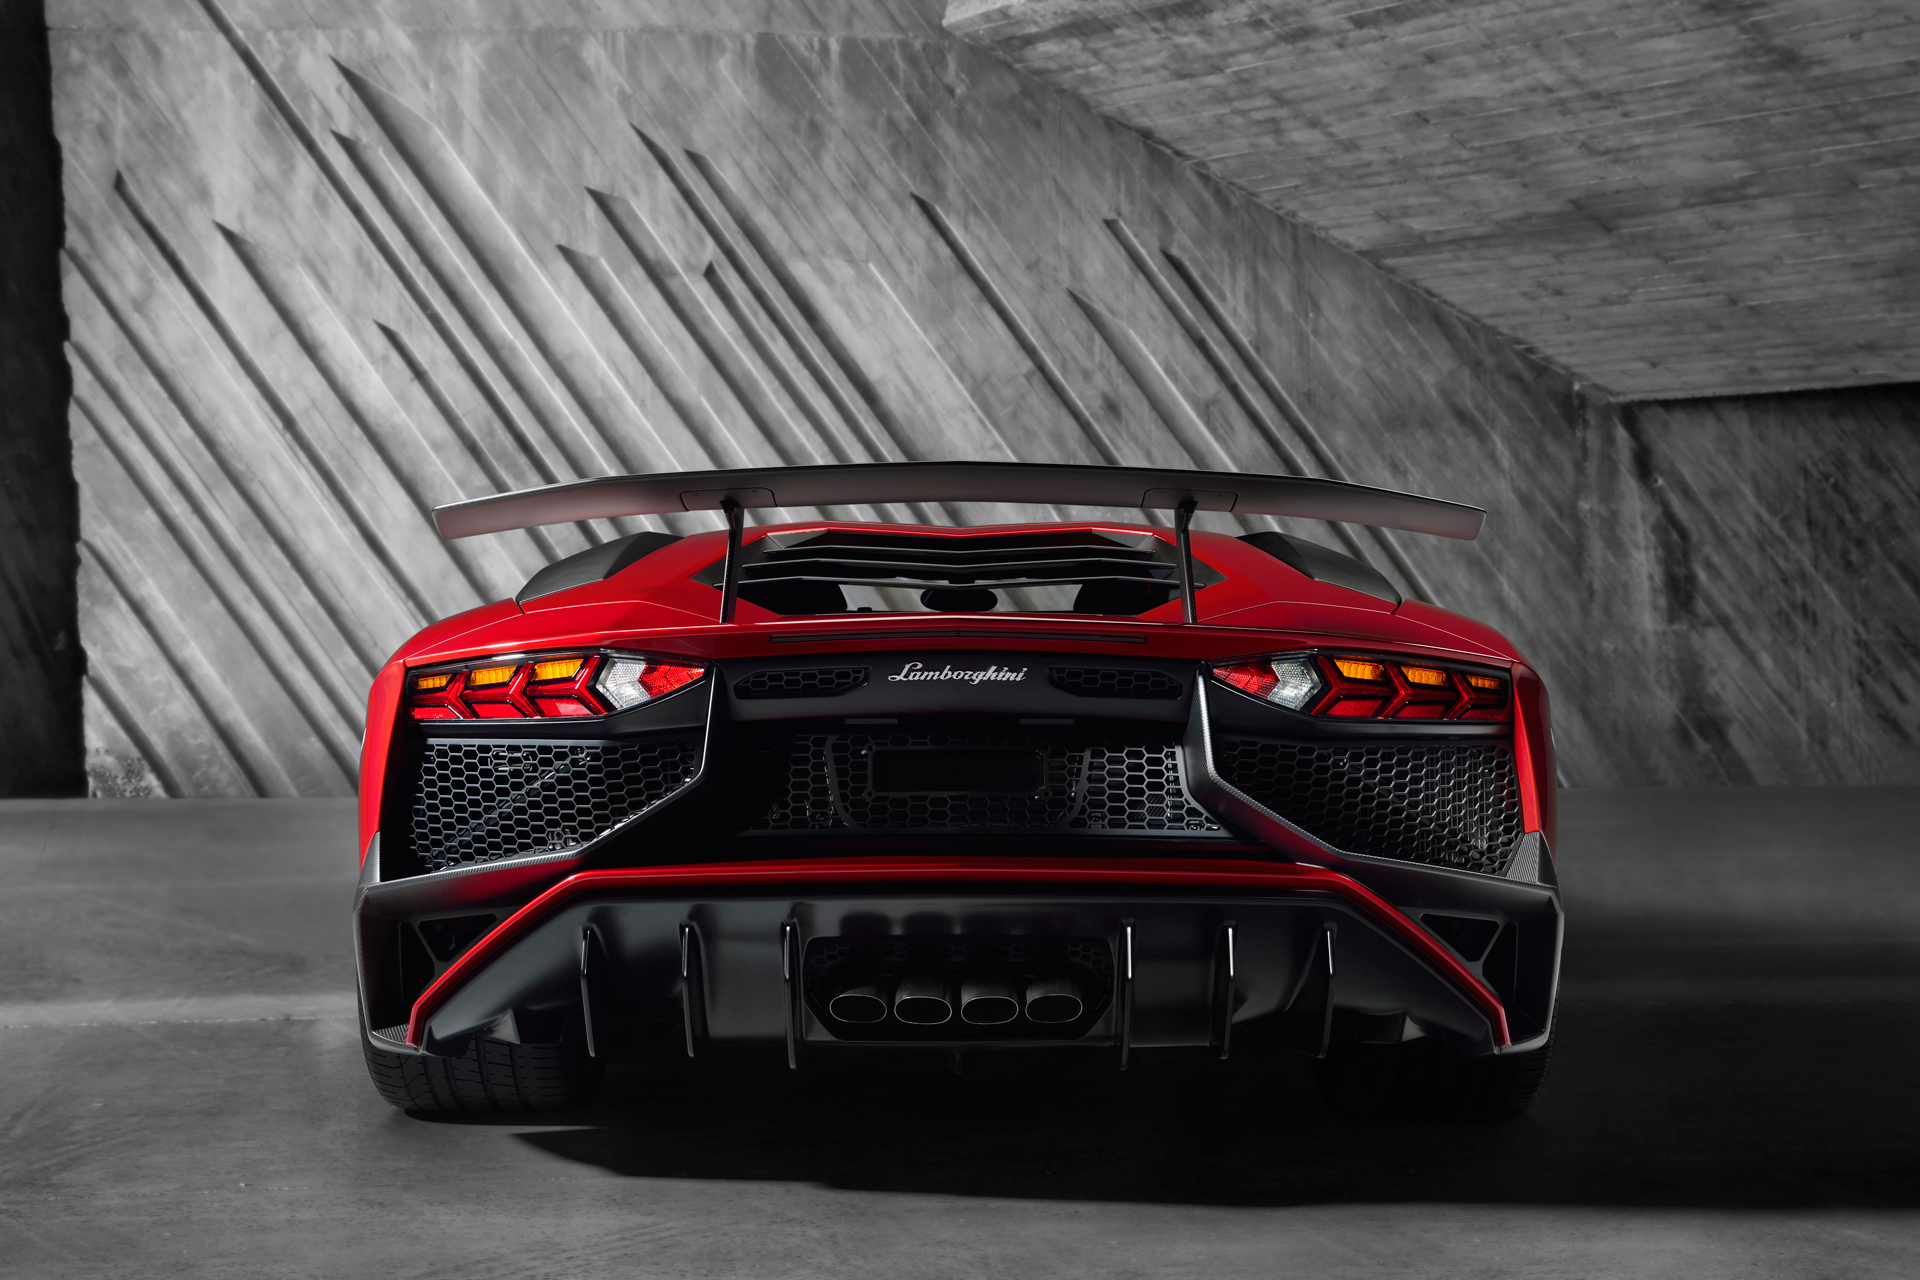 Lamborghini LP750-4 Superveloce - arrière